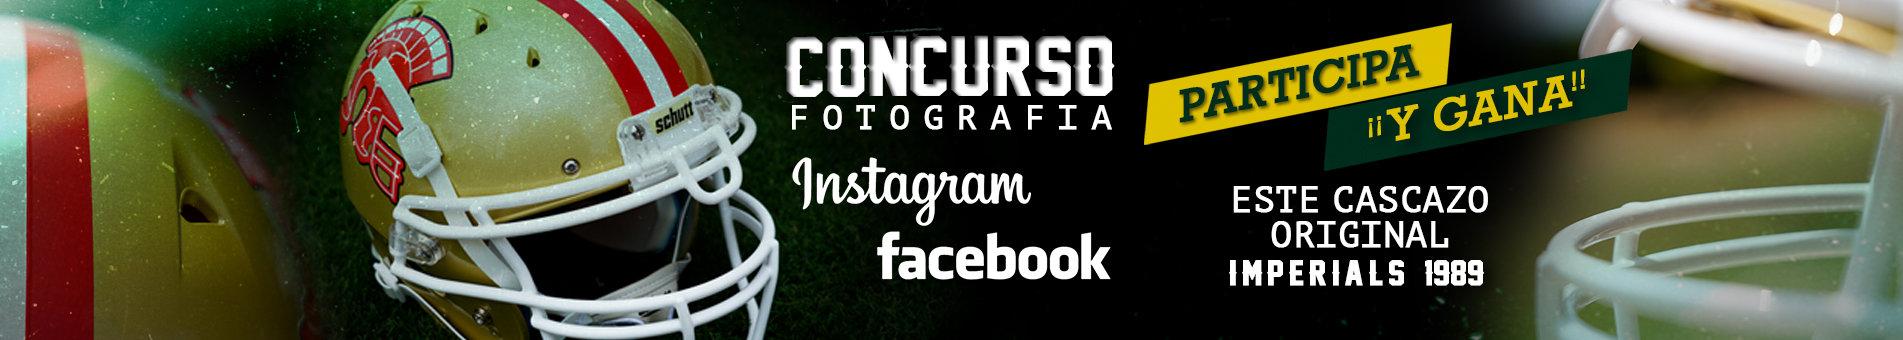 Foto Portada Wix Concurs 01 (1).jpg